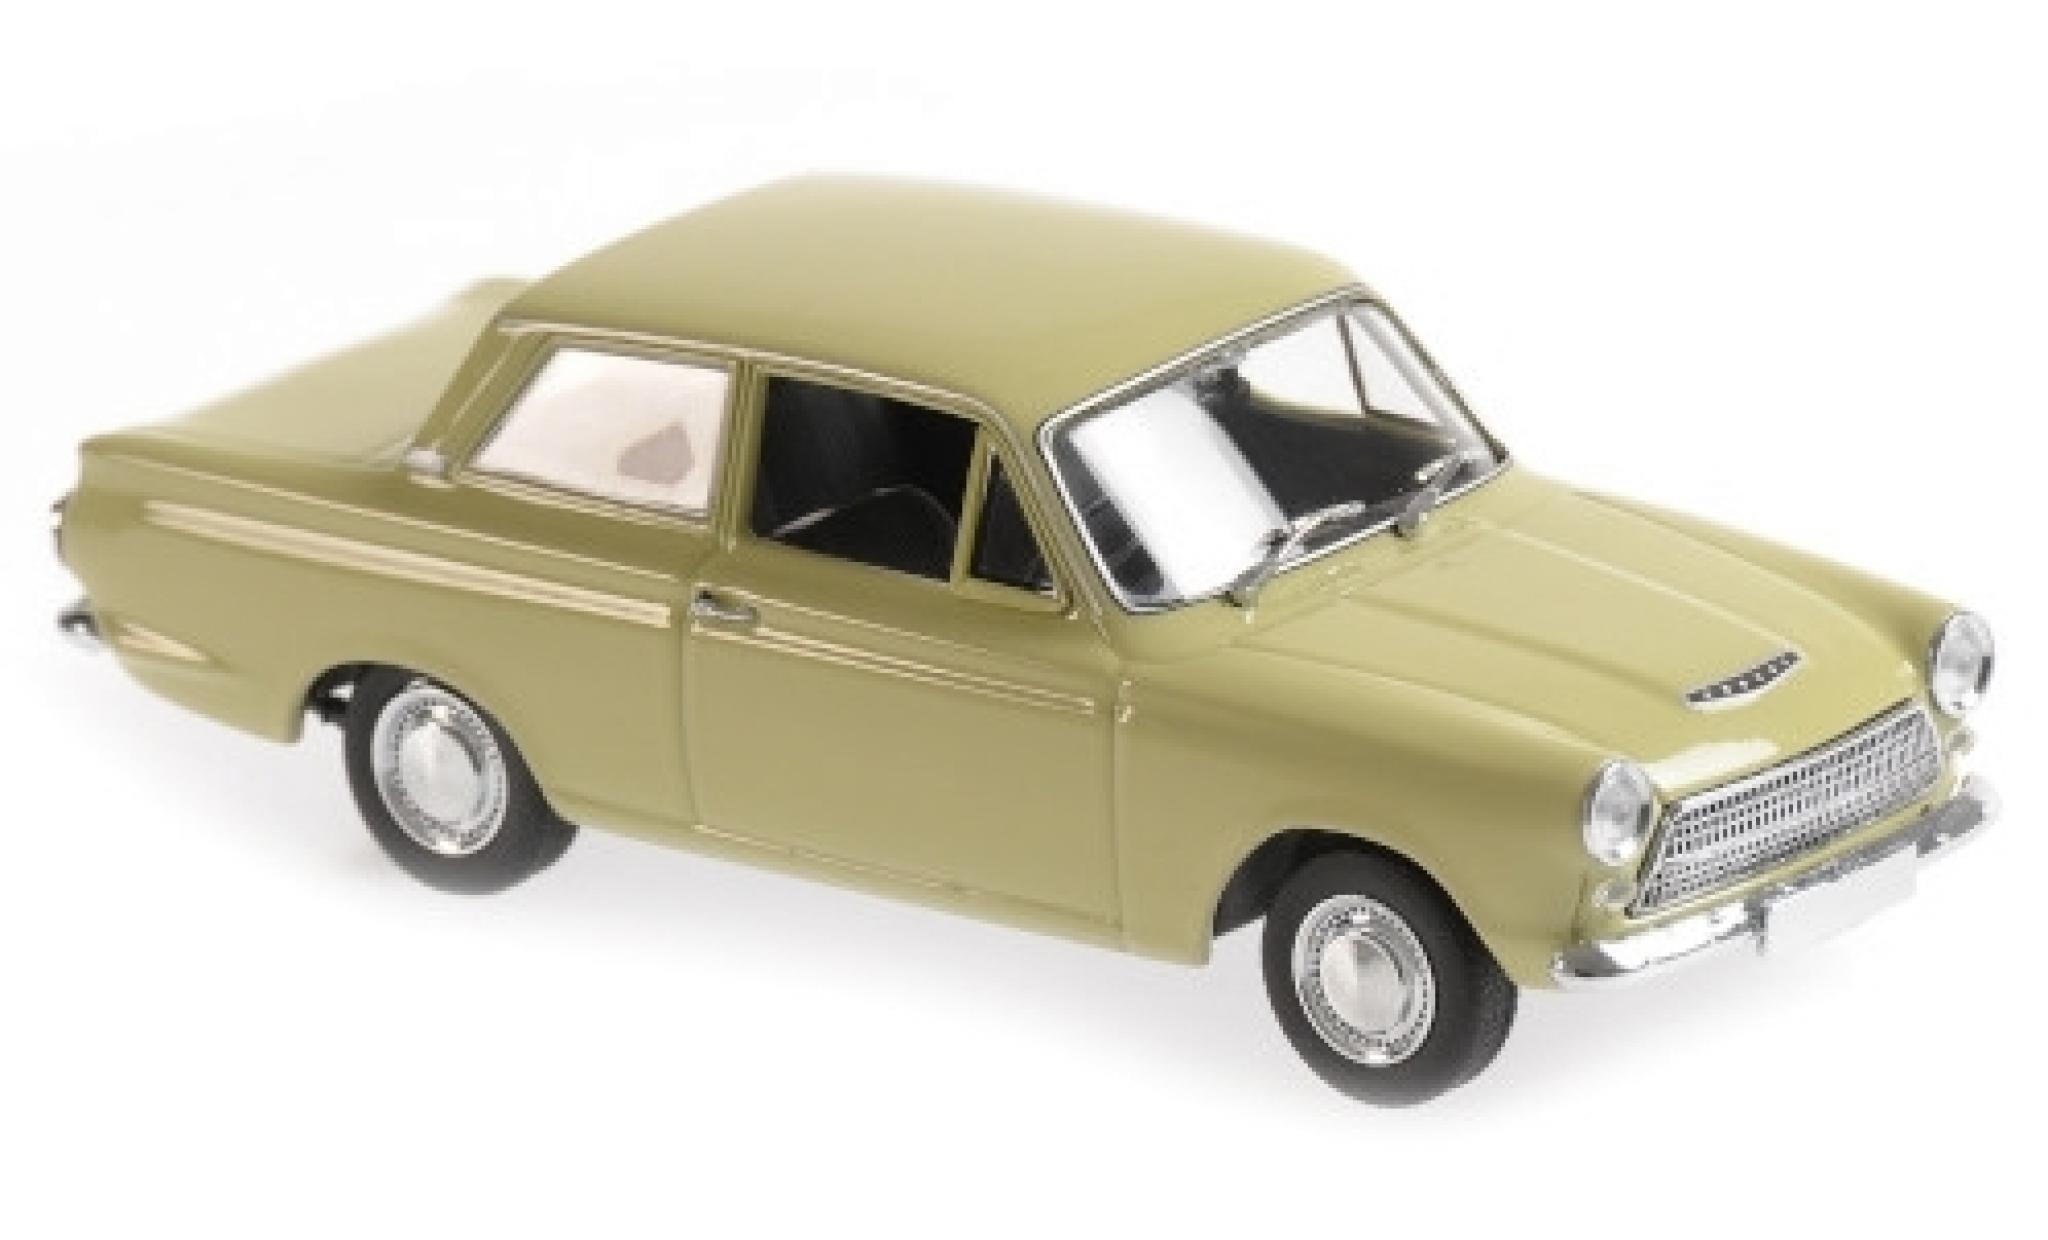 Ford Cortina 1/43 Maxichamps MkI verte RHD 1962